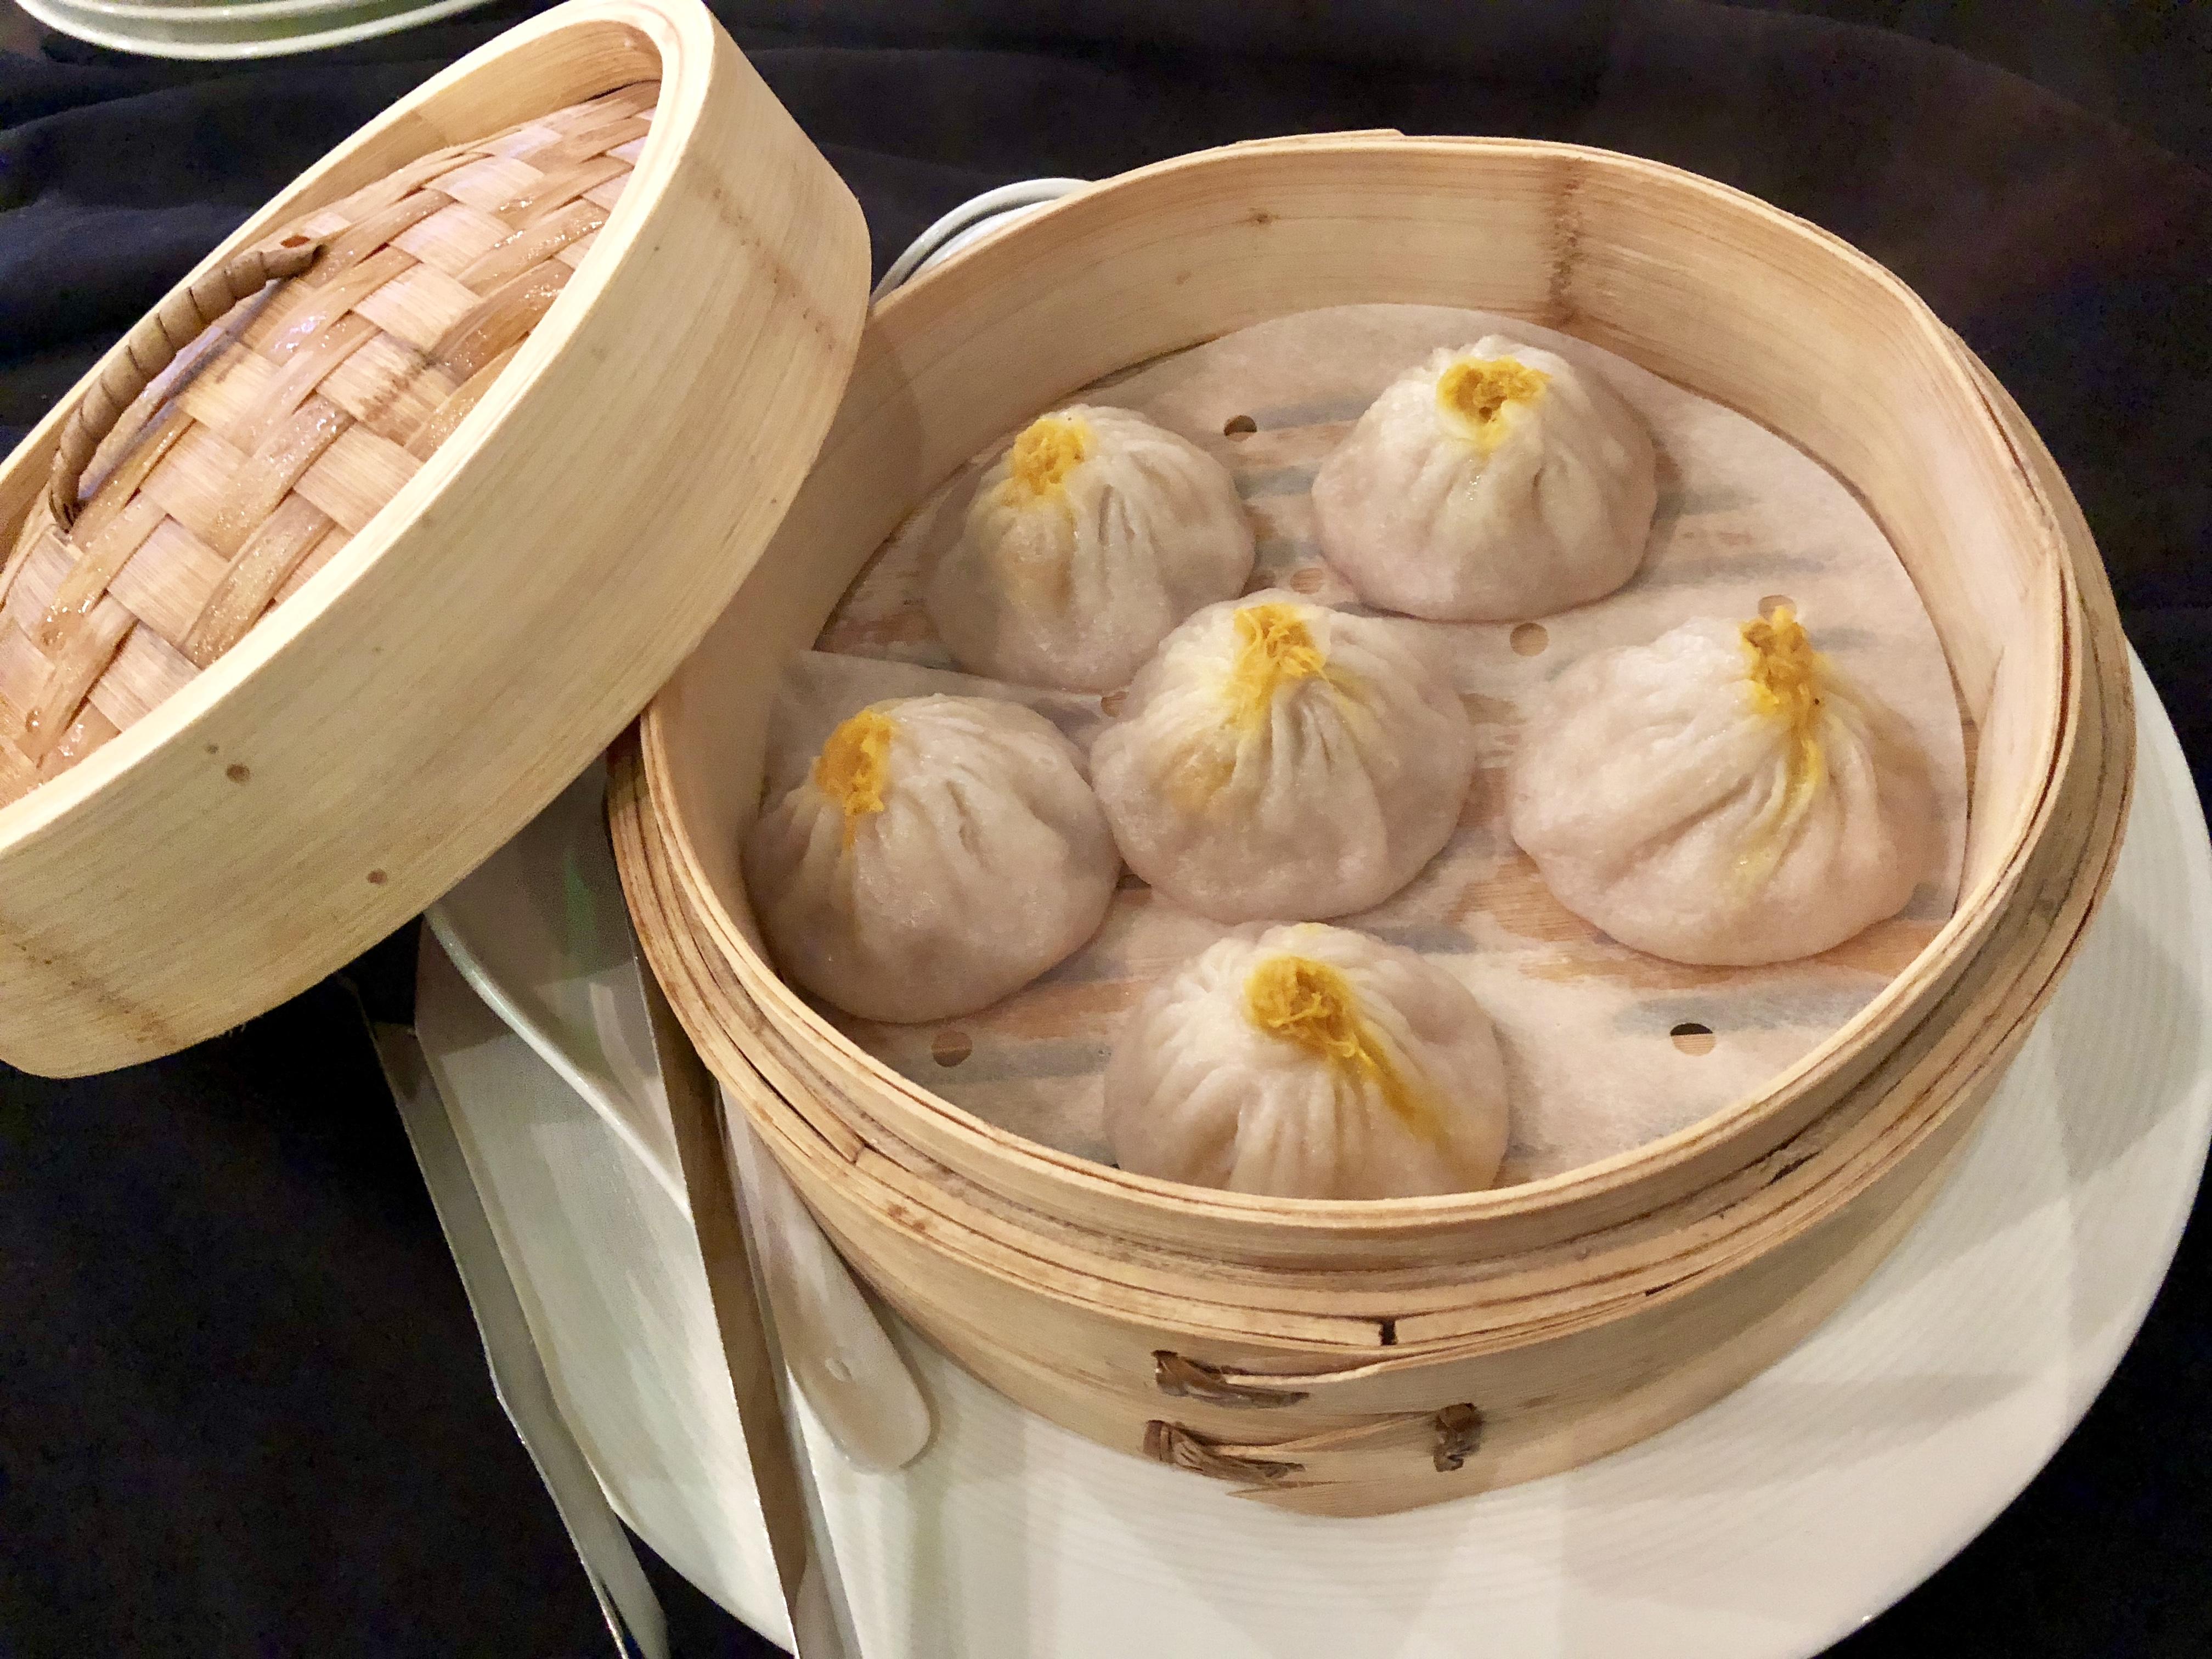 Taiwanese Food Delivery | Best Restaurants Near You | Grubhub